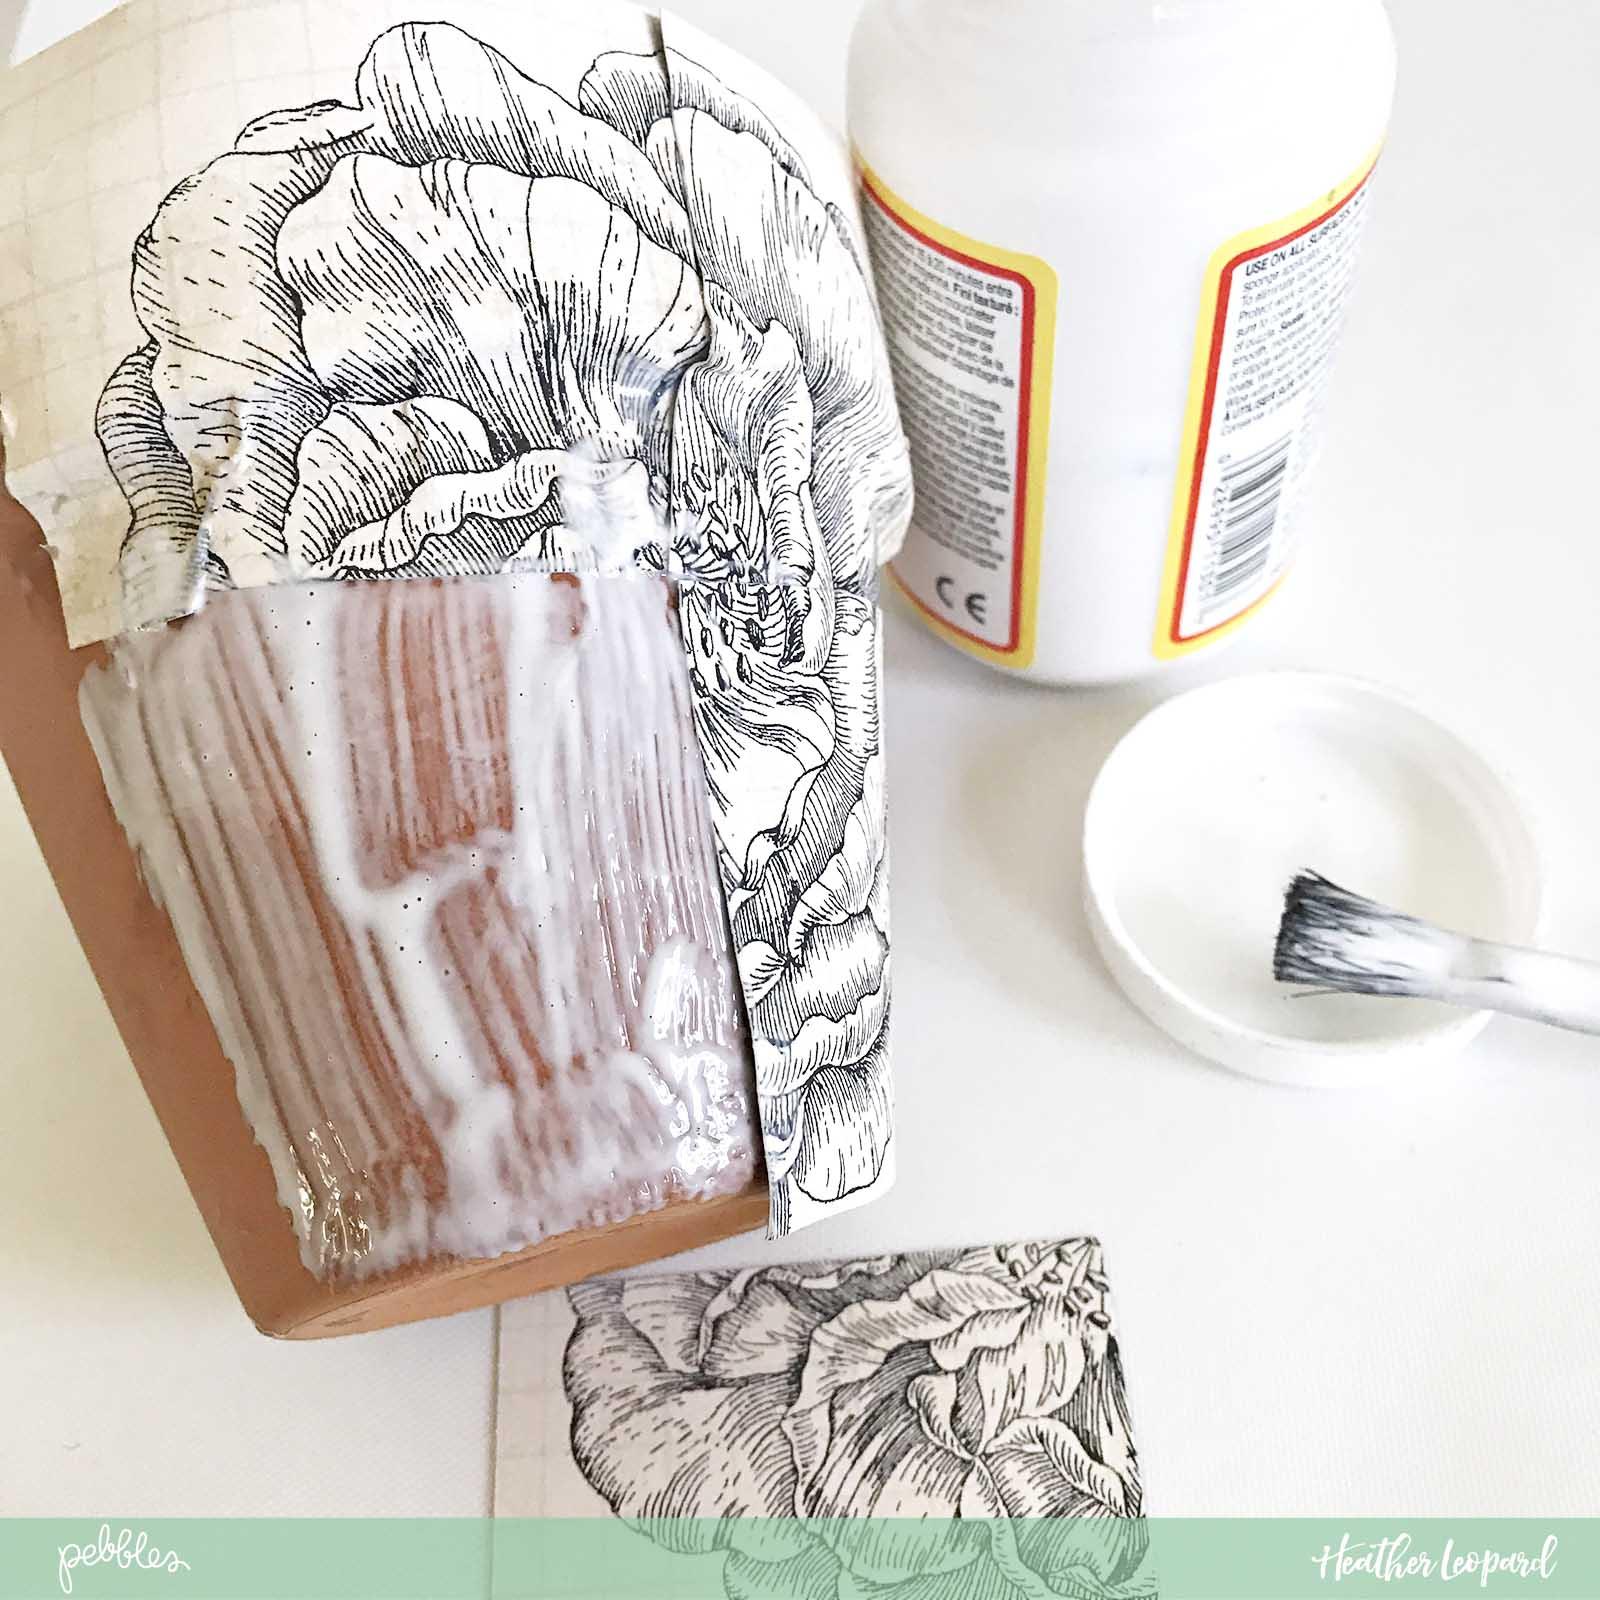 DIY Teacher Gift by @heatherleopard using the @PebblesInc #jenhadfield #simplelife collection #teachergift #DIY #decoupagepot #madewithpebbles